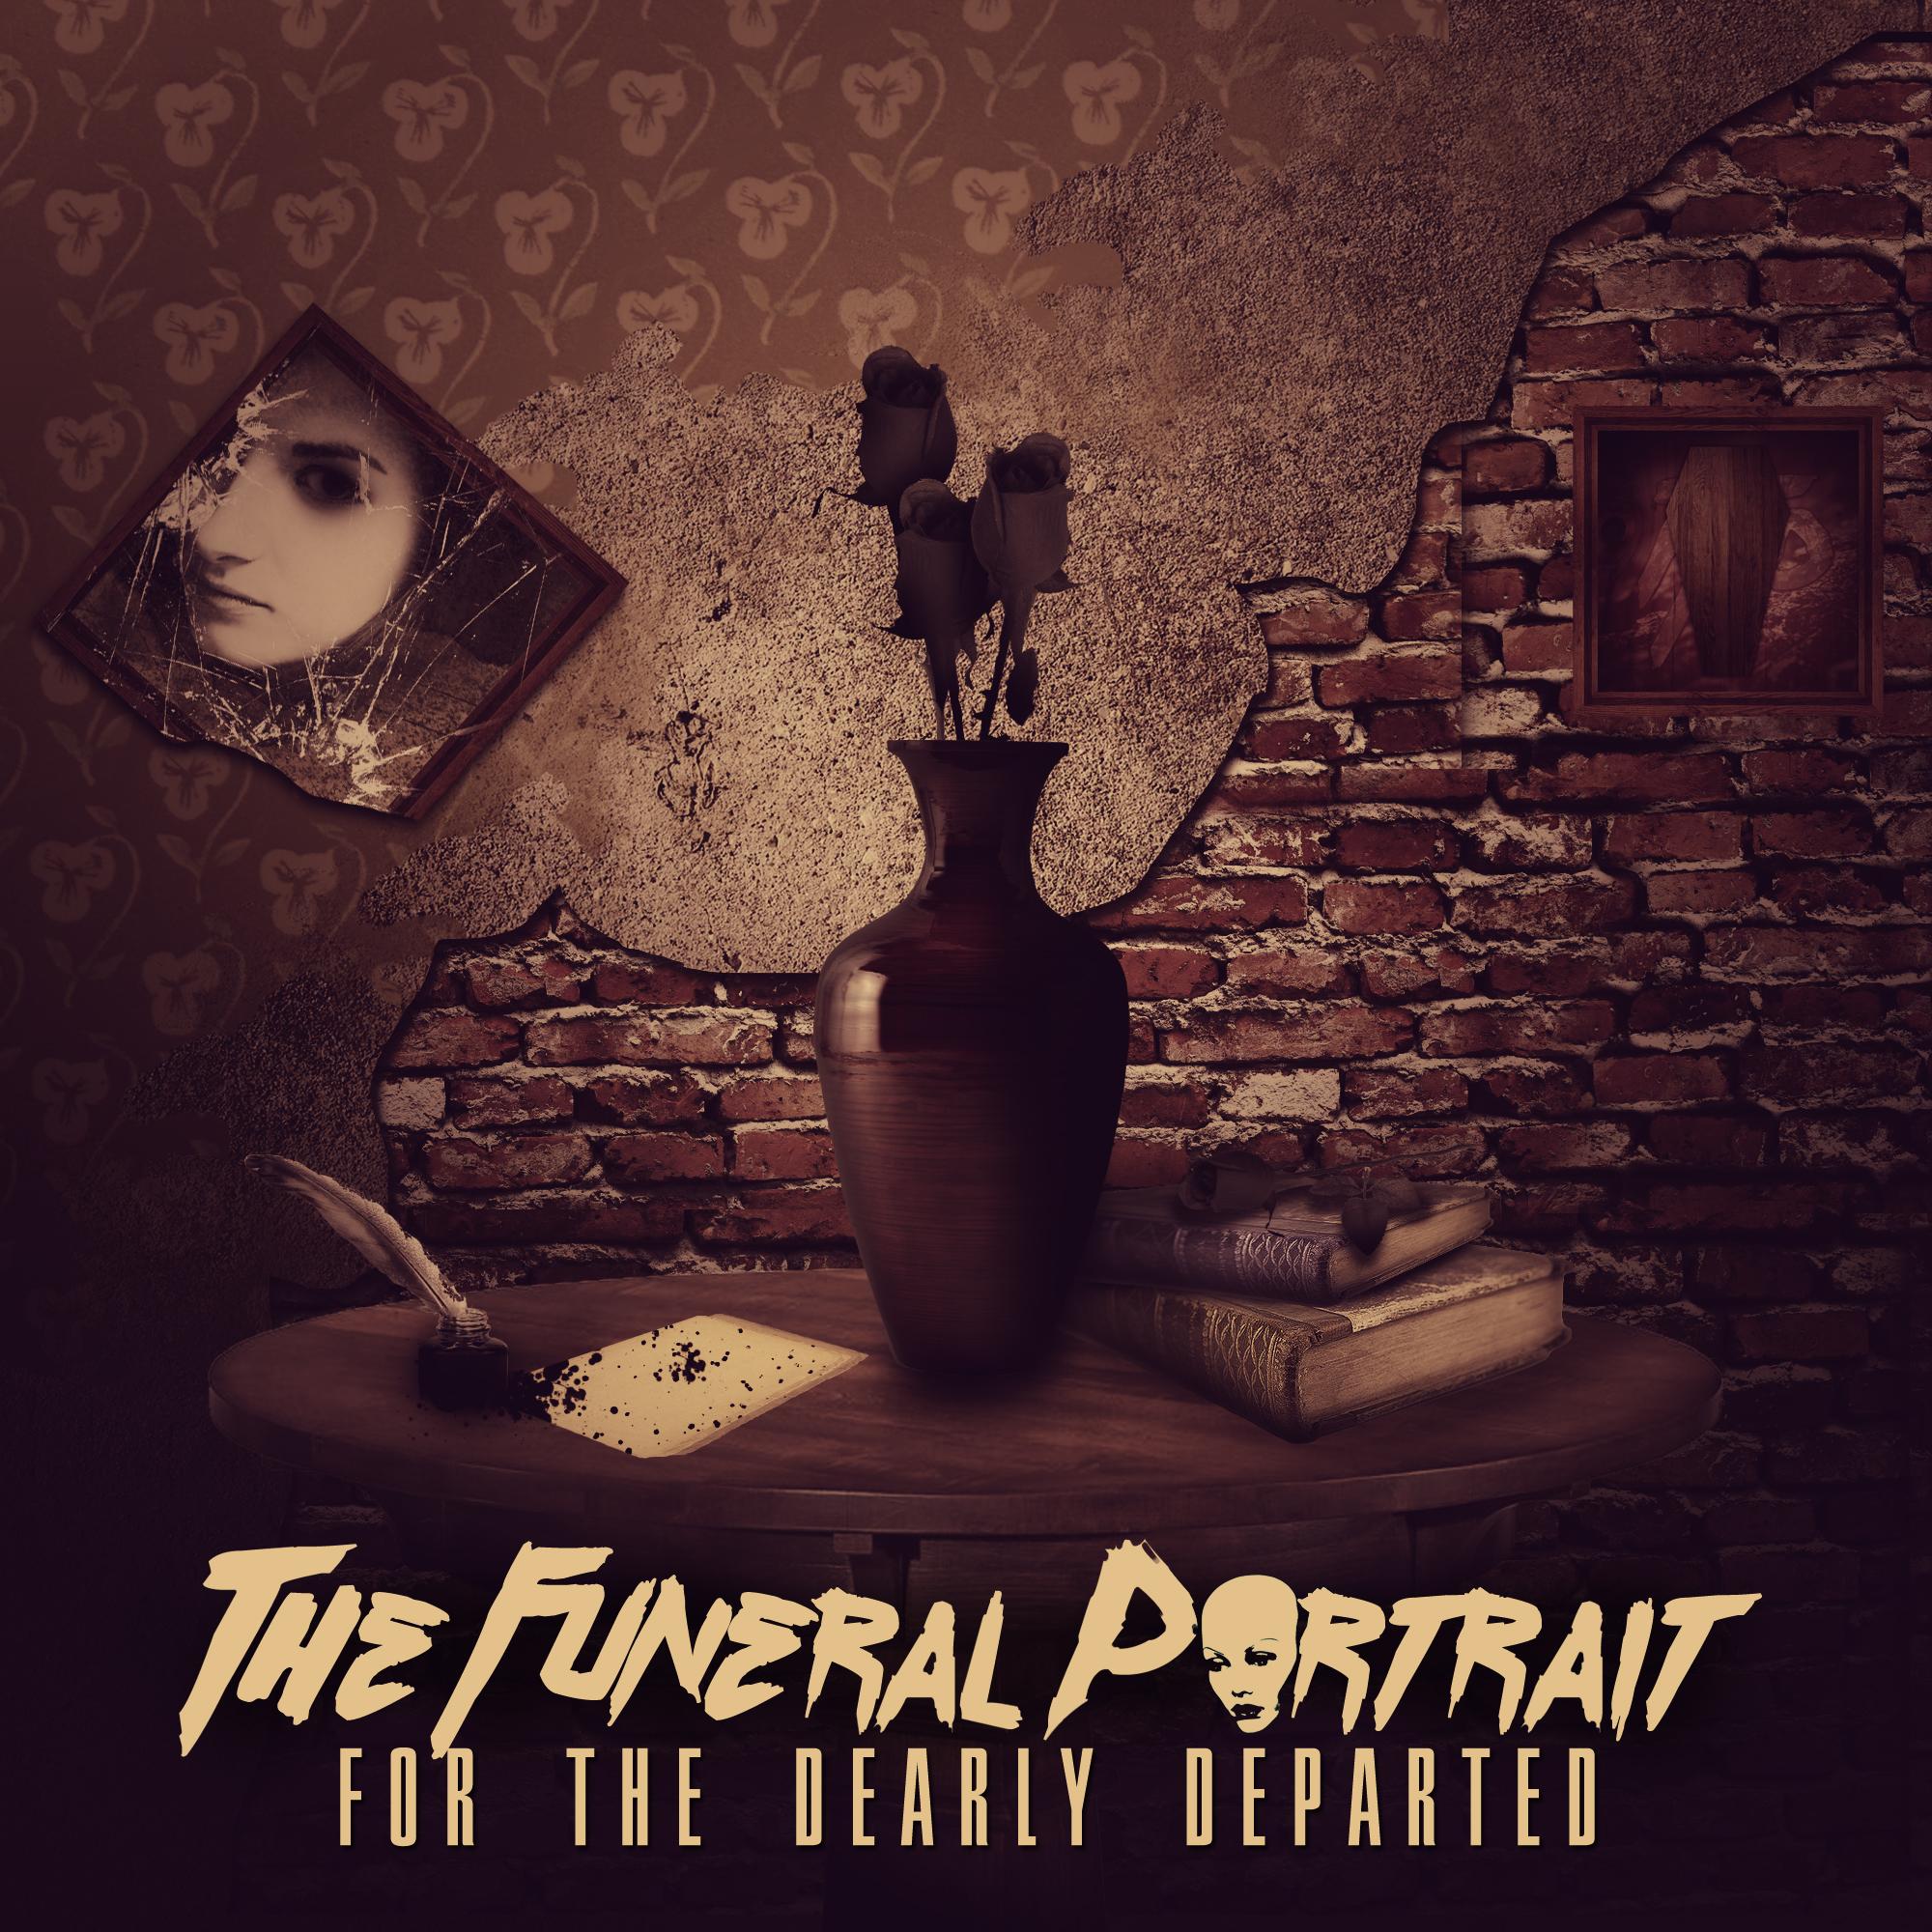 The Funeral Portrait